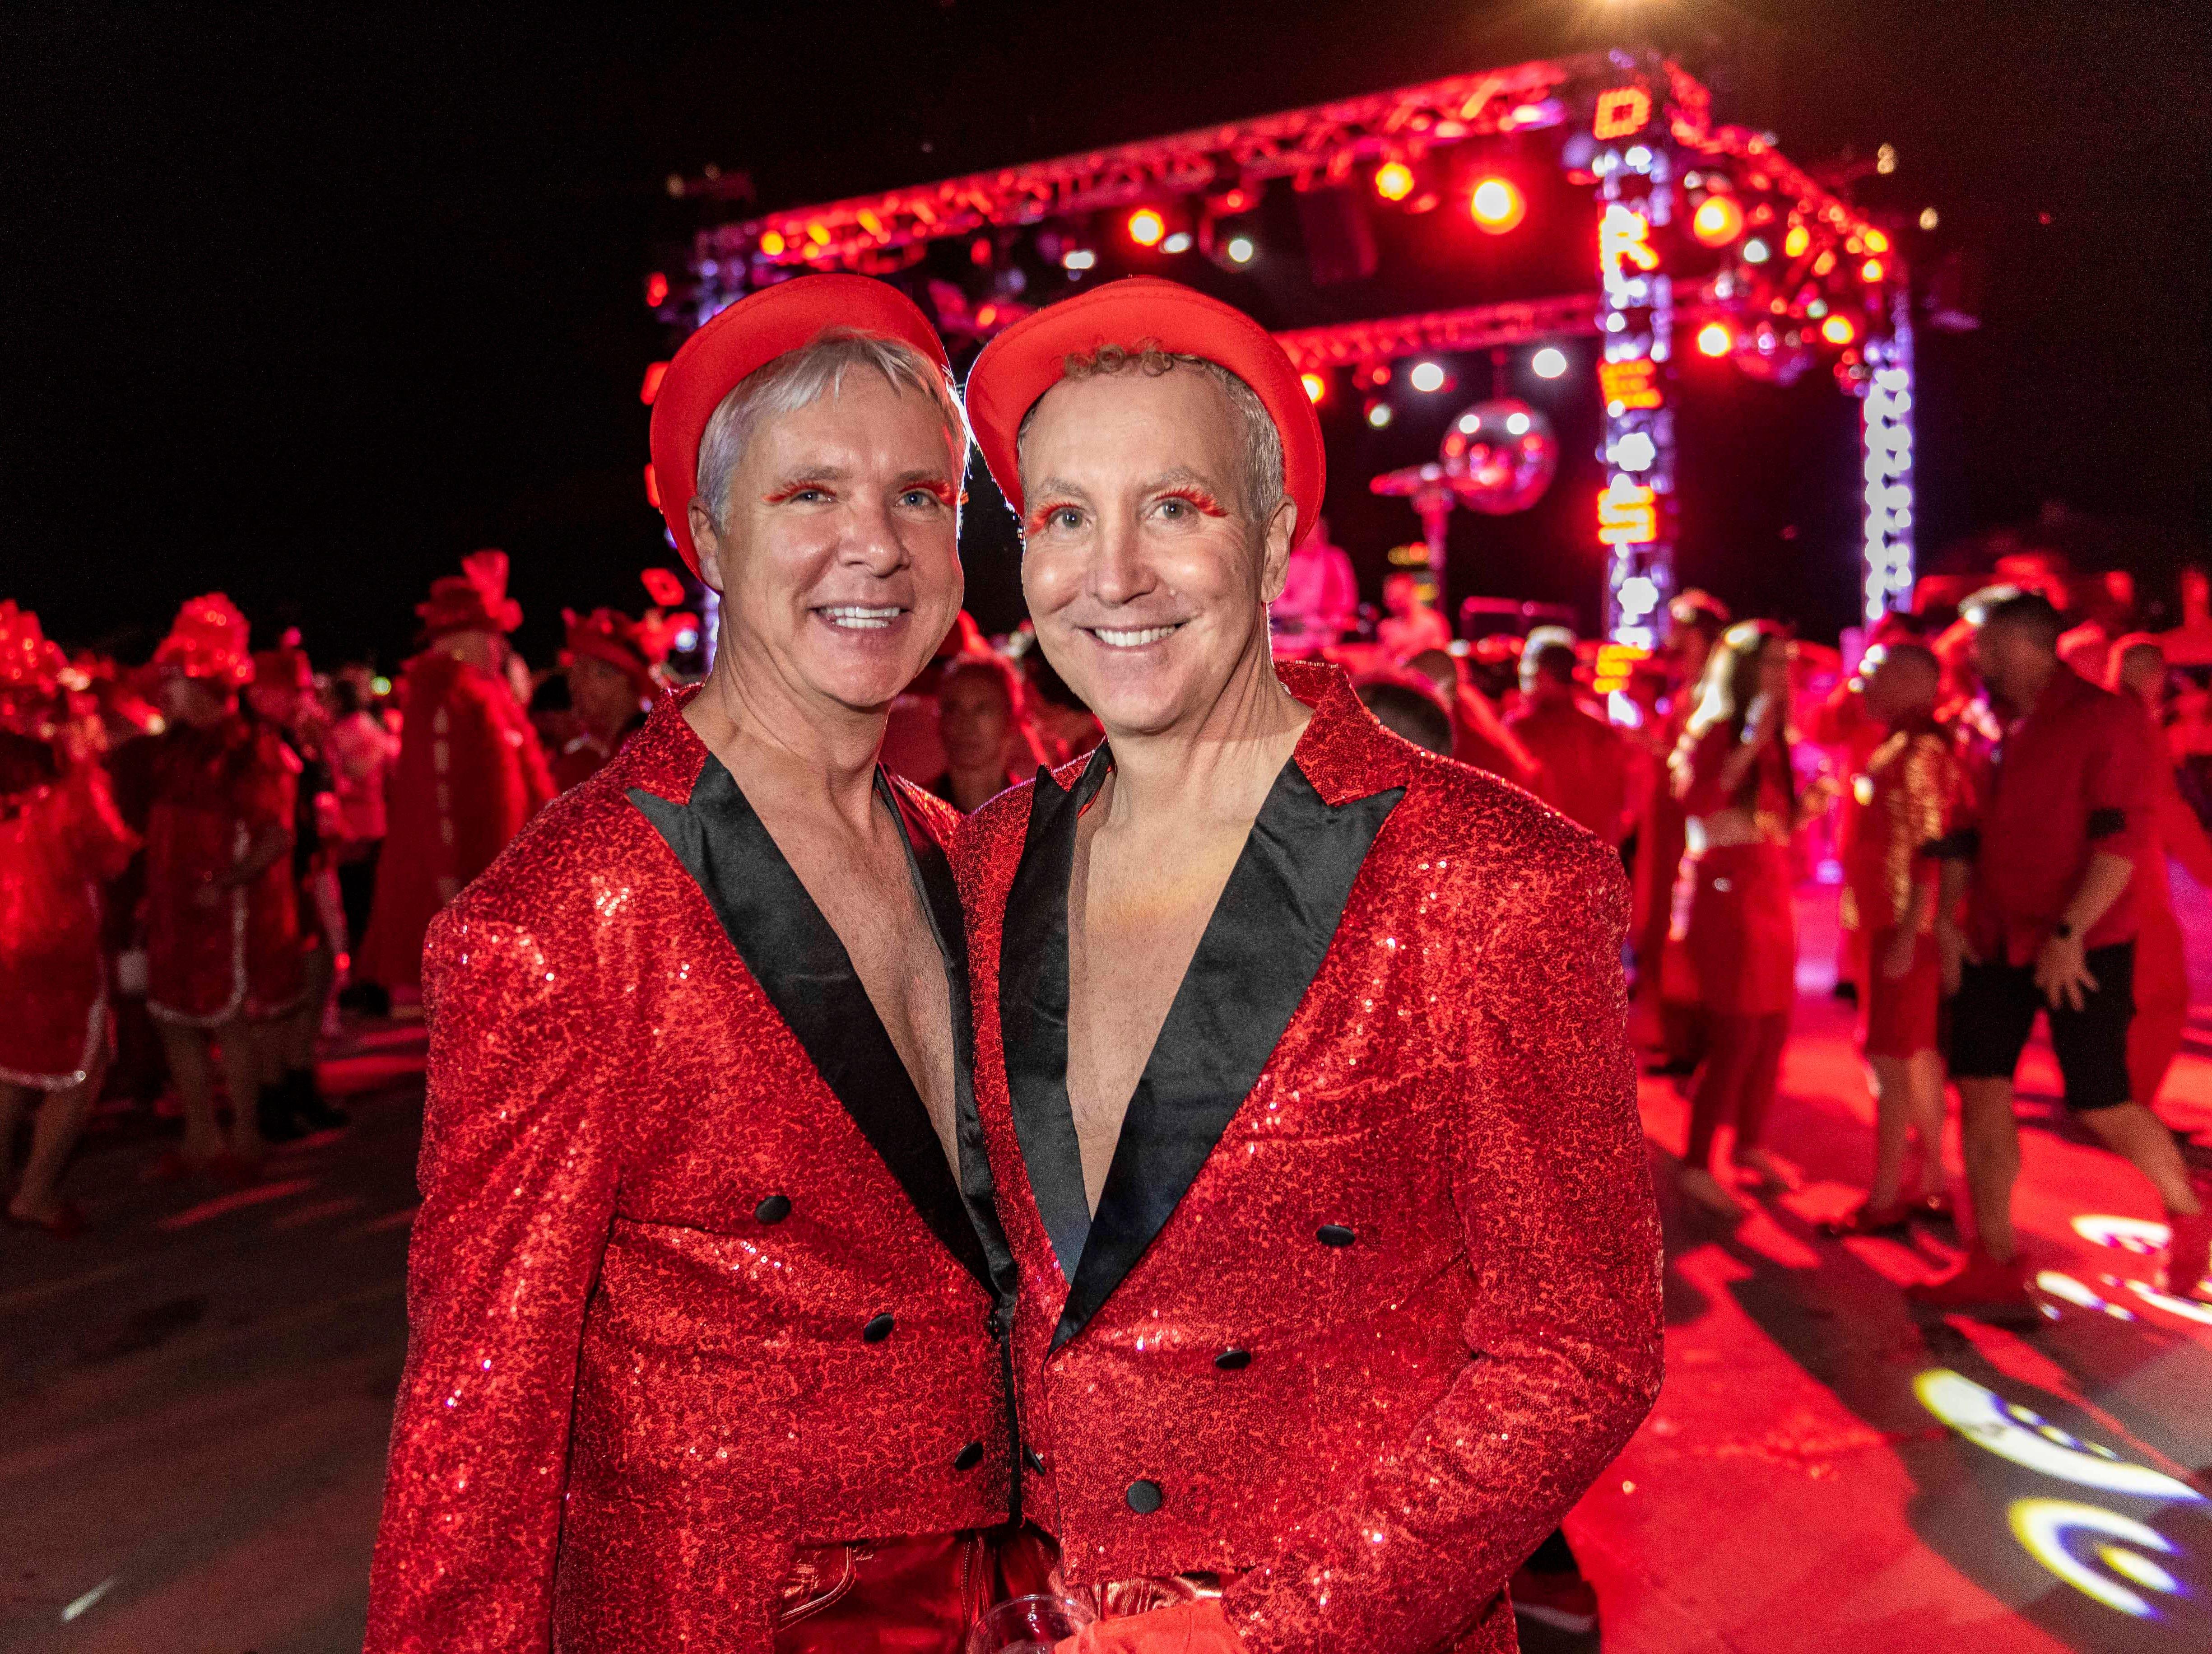 Red Dress Dress Red Gala-An Expressive Event